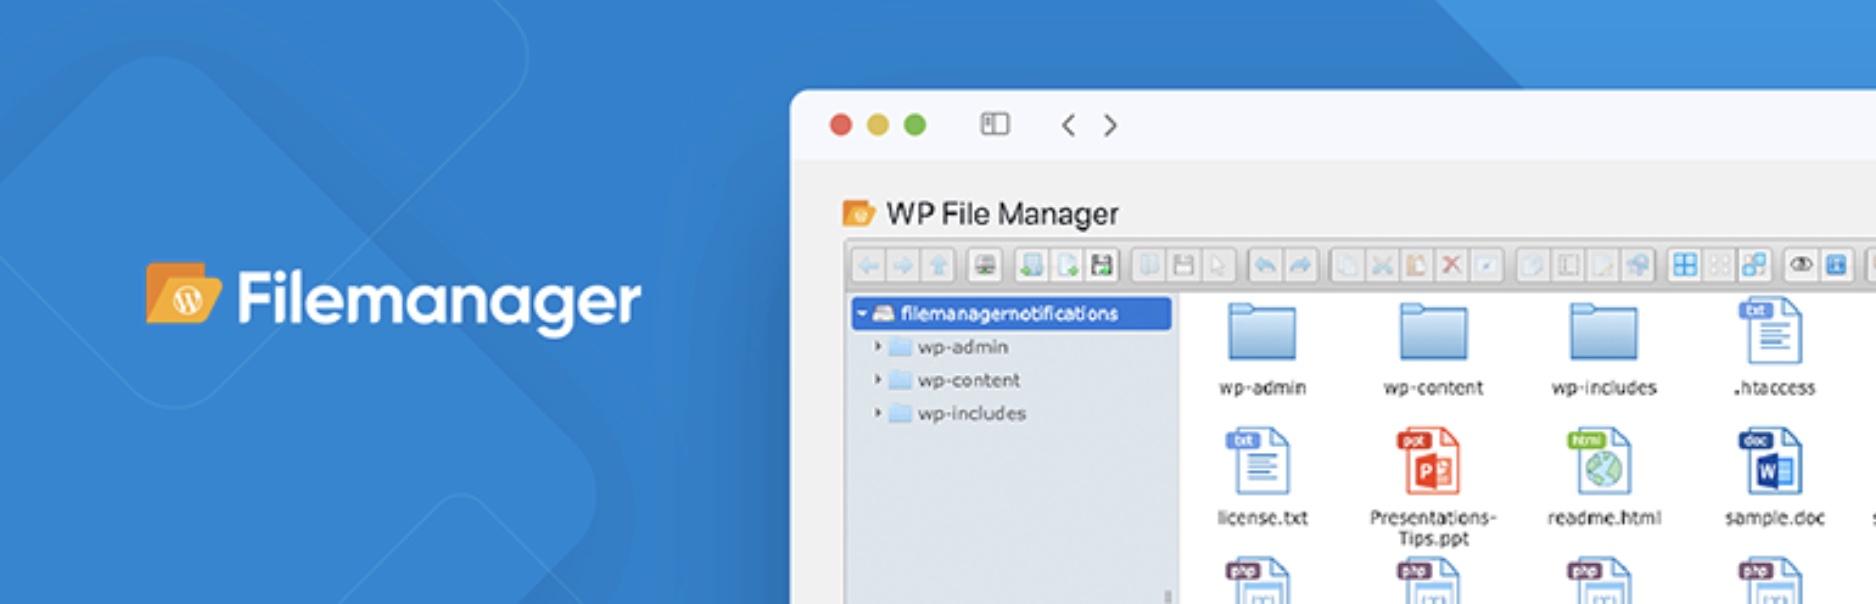 WordPressプラグイン「File Manager」